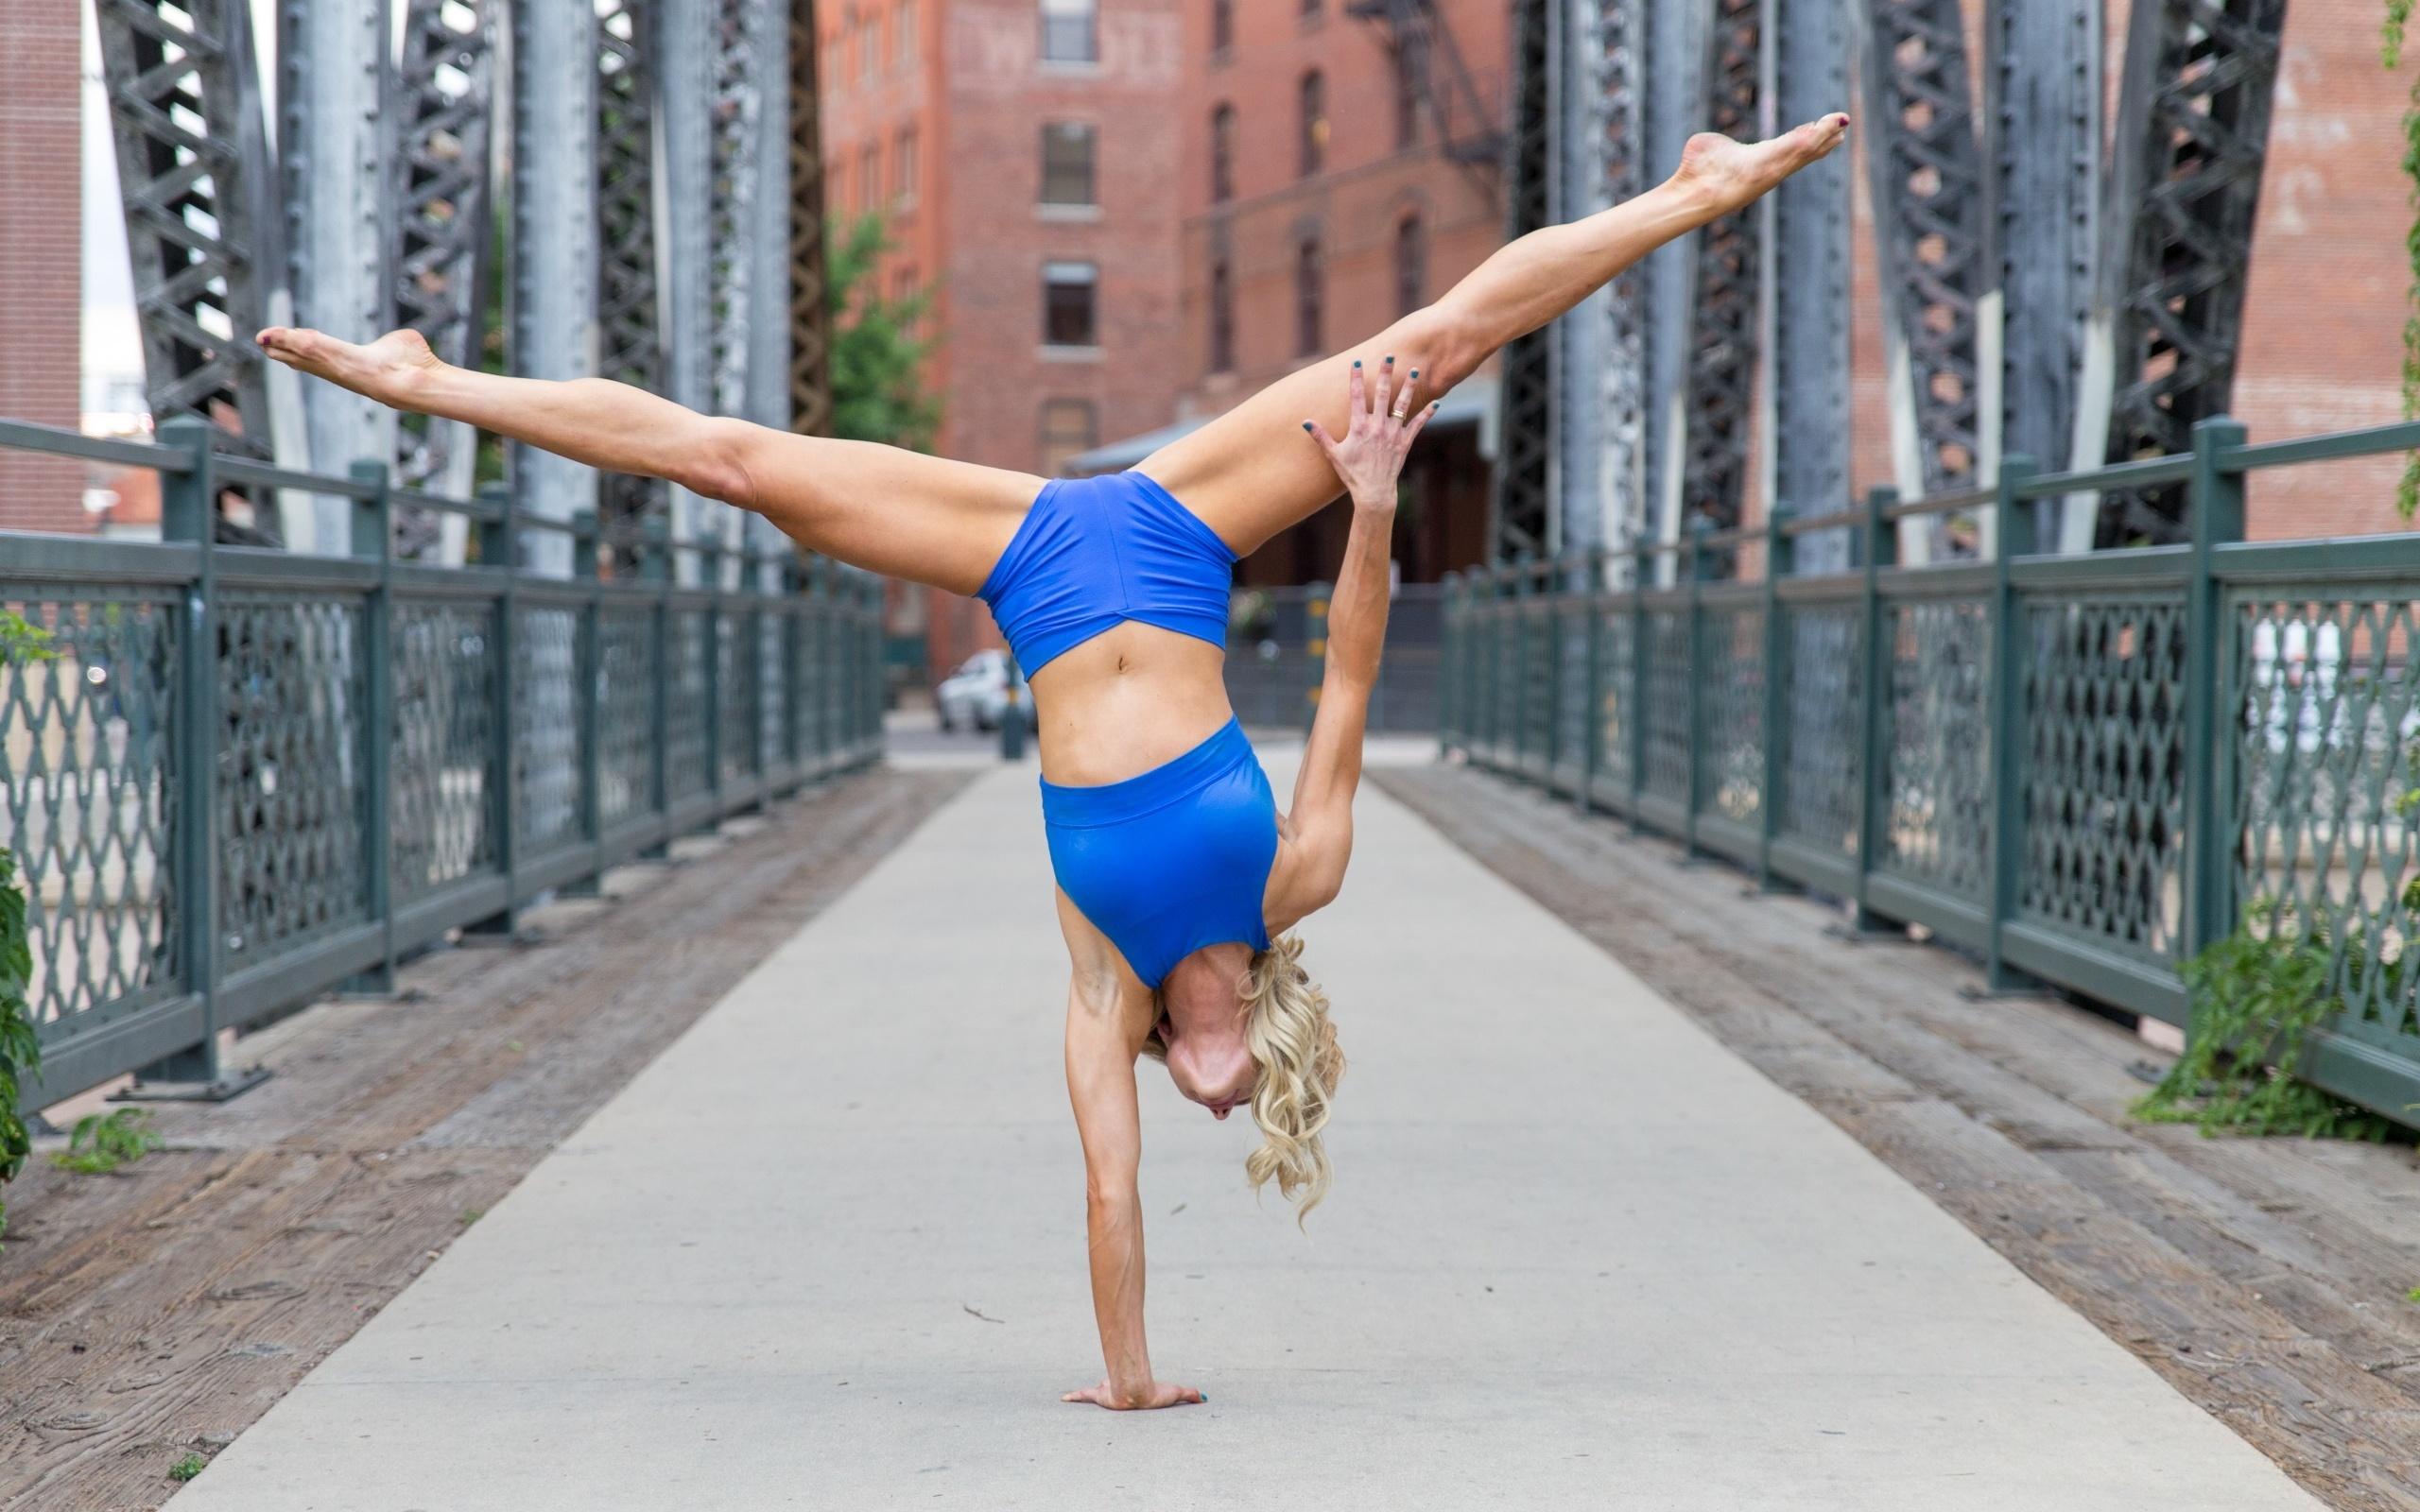 девушка, спорт, гимнастика, мотивация,сила,красота,фигура,хороша